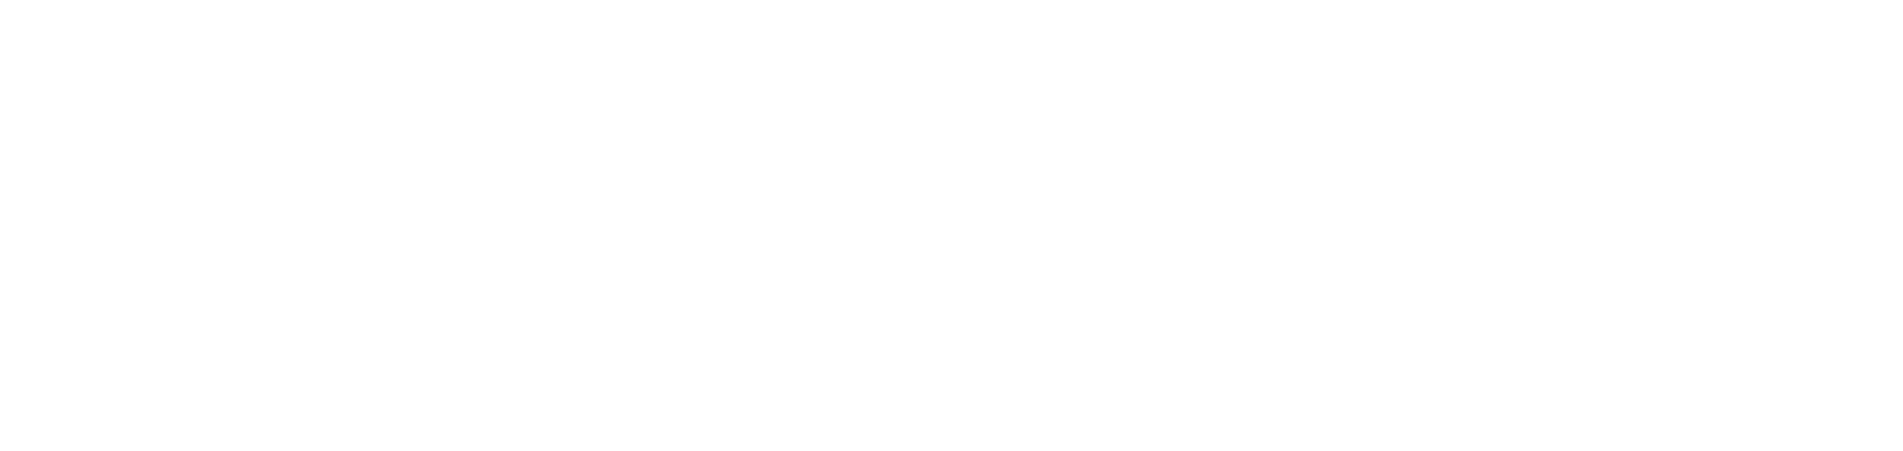 Objectspace Logo Framed.png